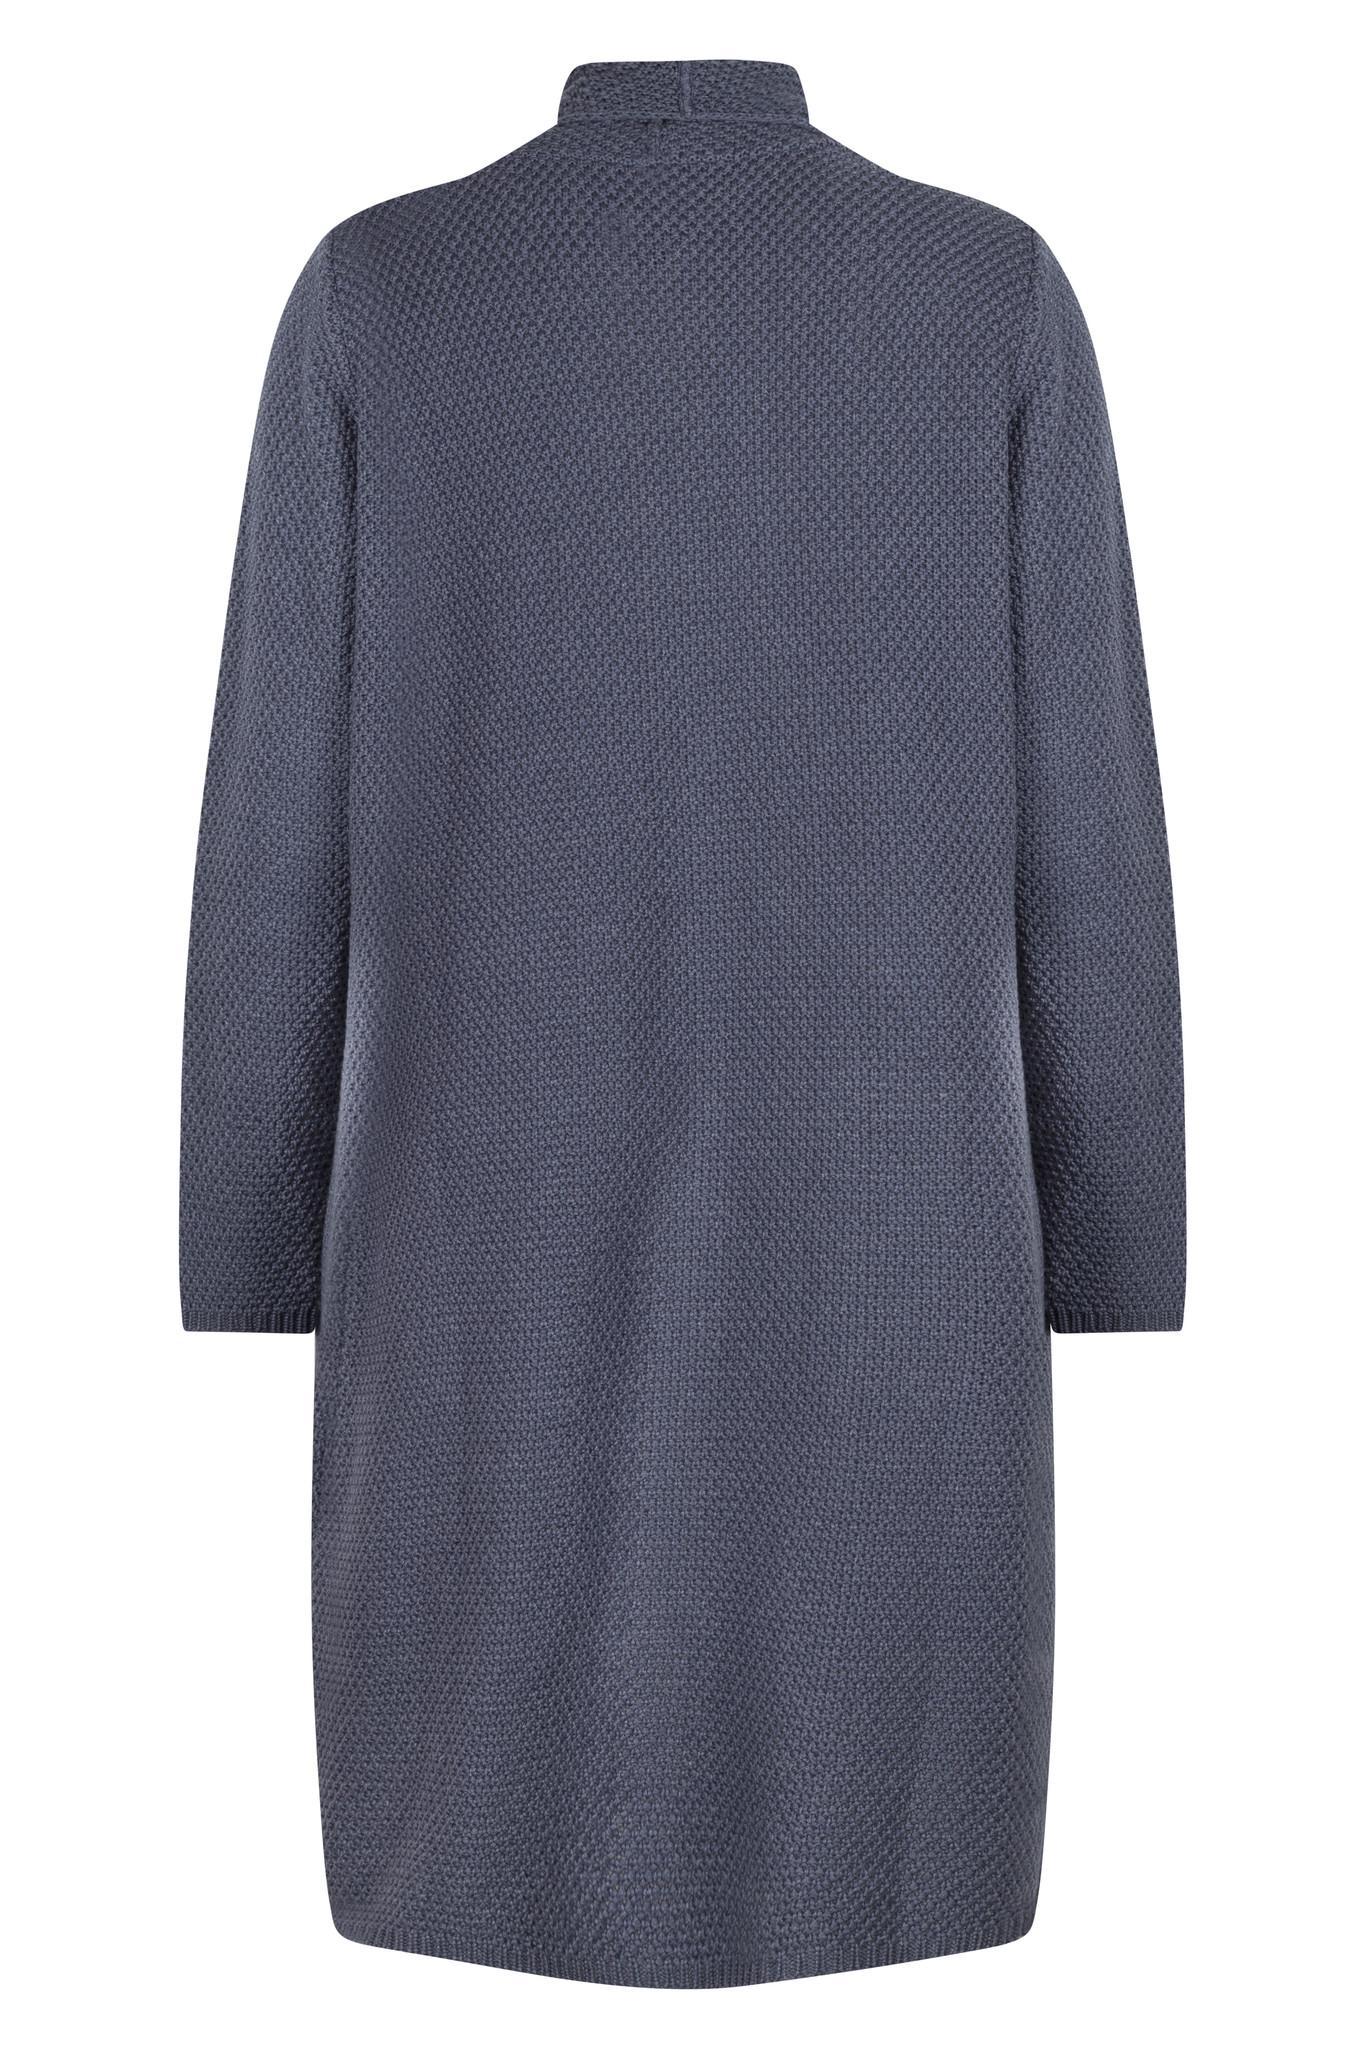 Zoso Zoso Tessa vest shadow blue